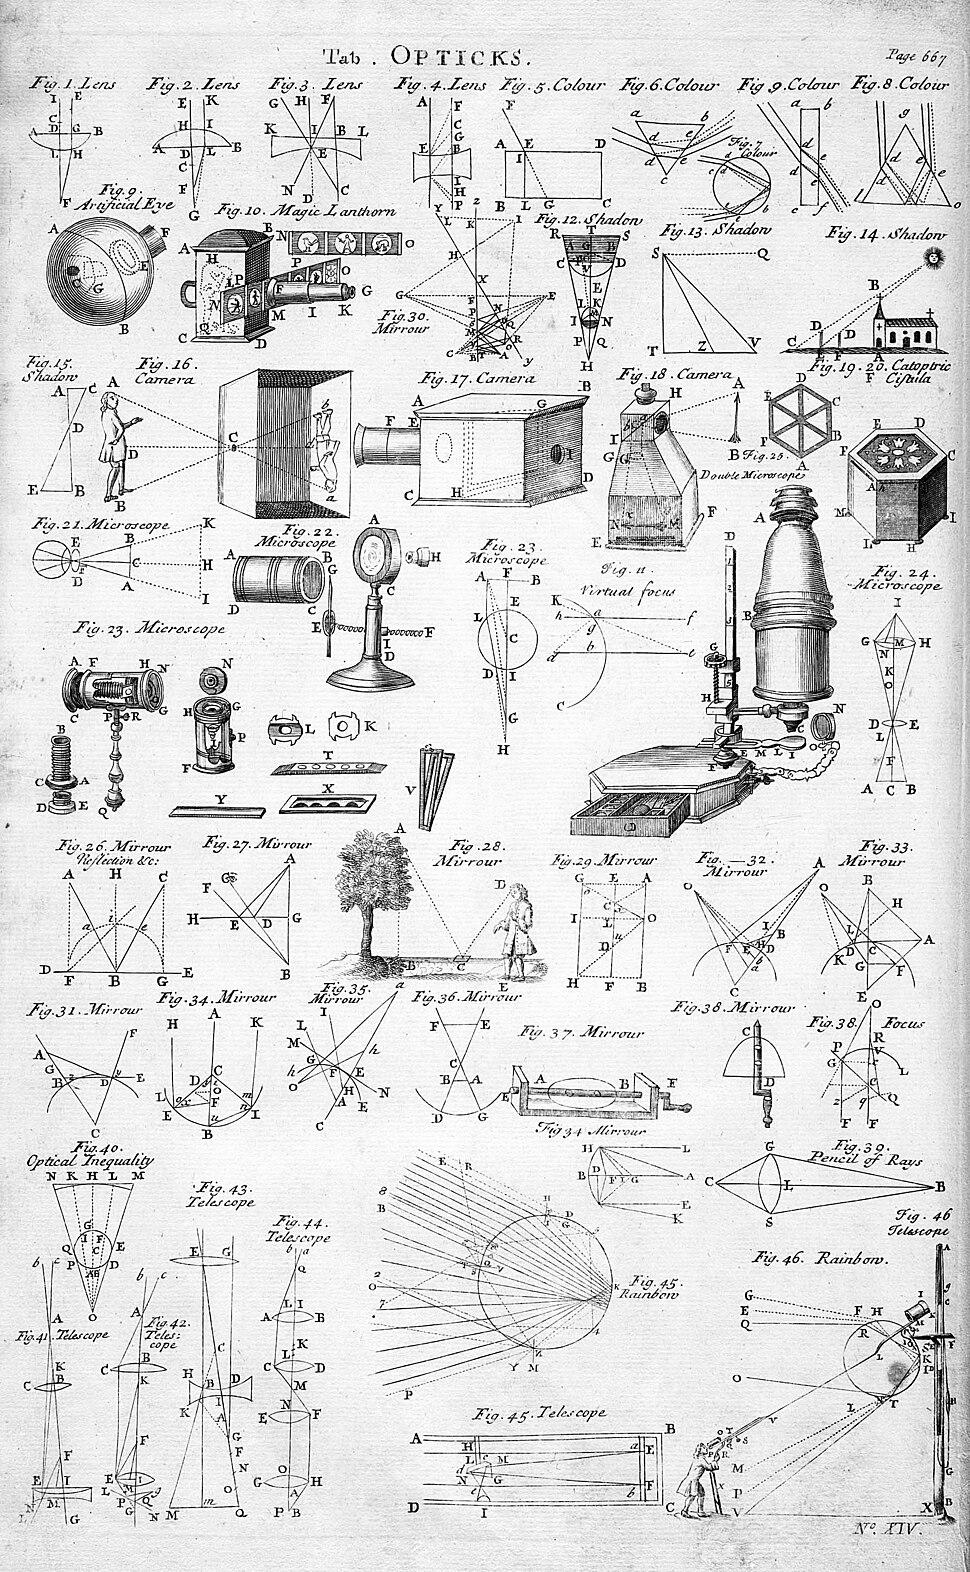 Table of Opticks, Cyclopaedia, Volume 2